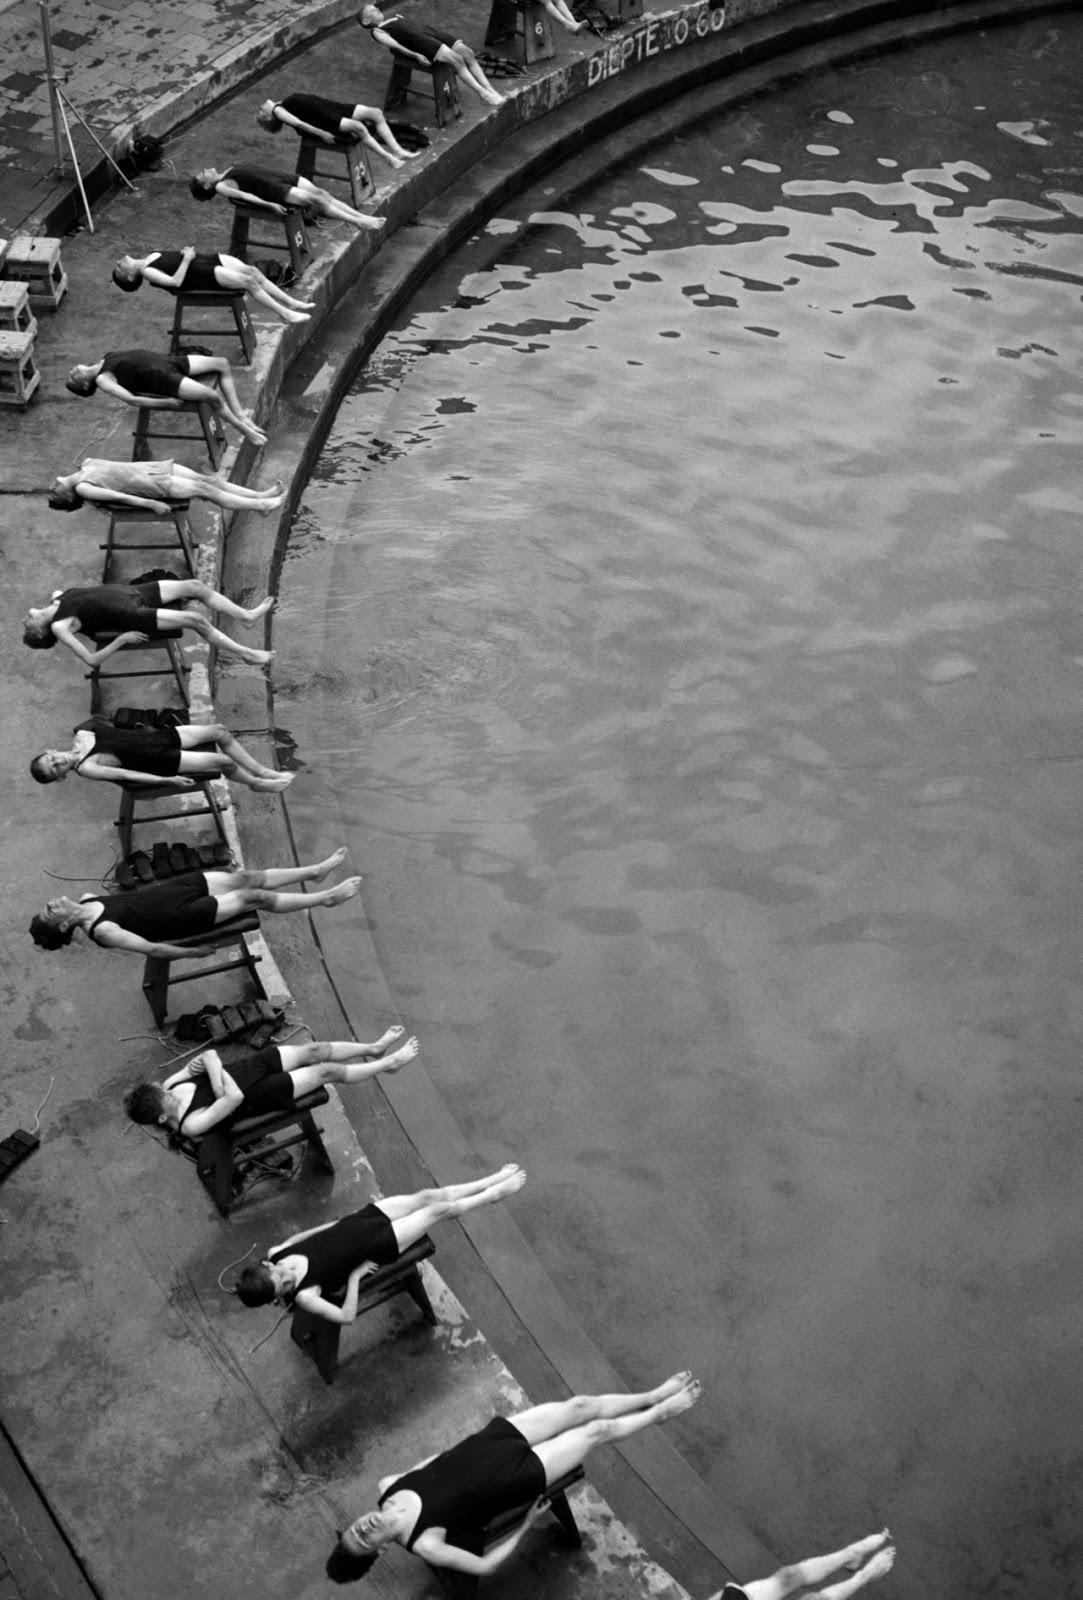 Pool in den haag - 5 4